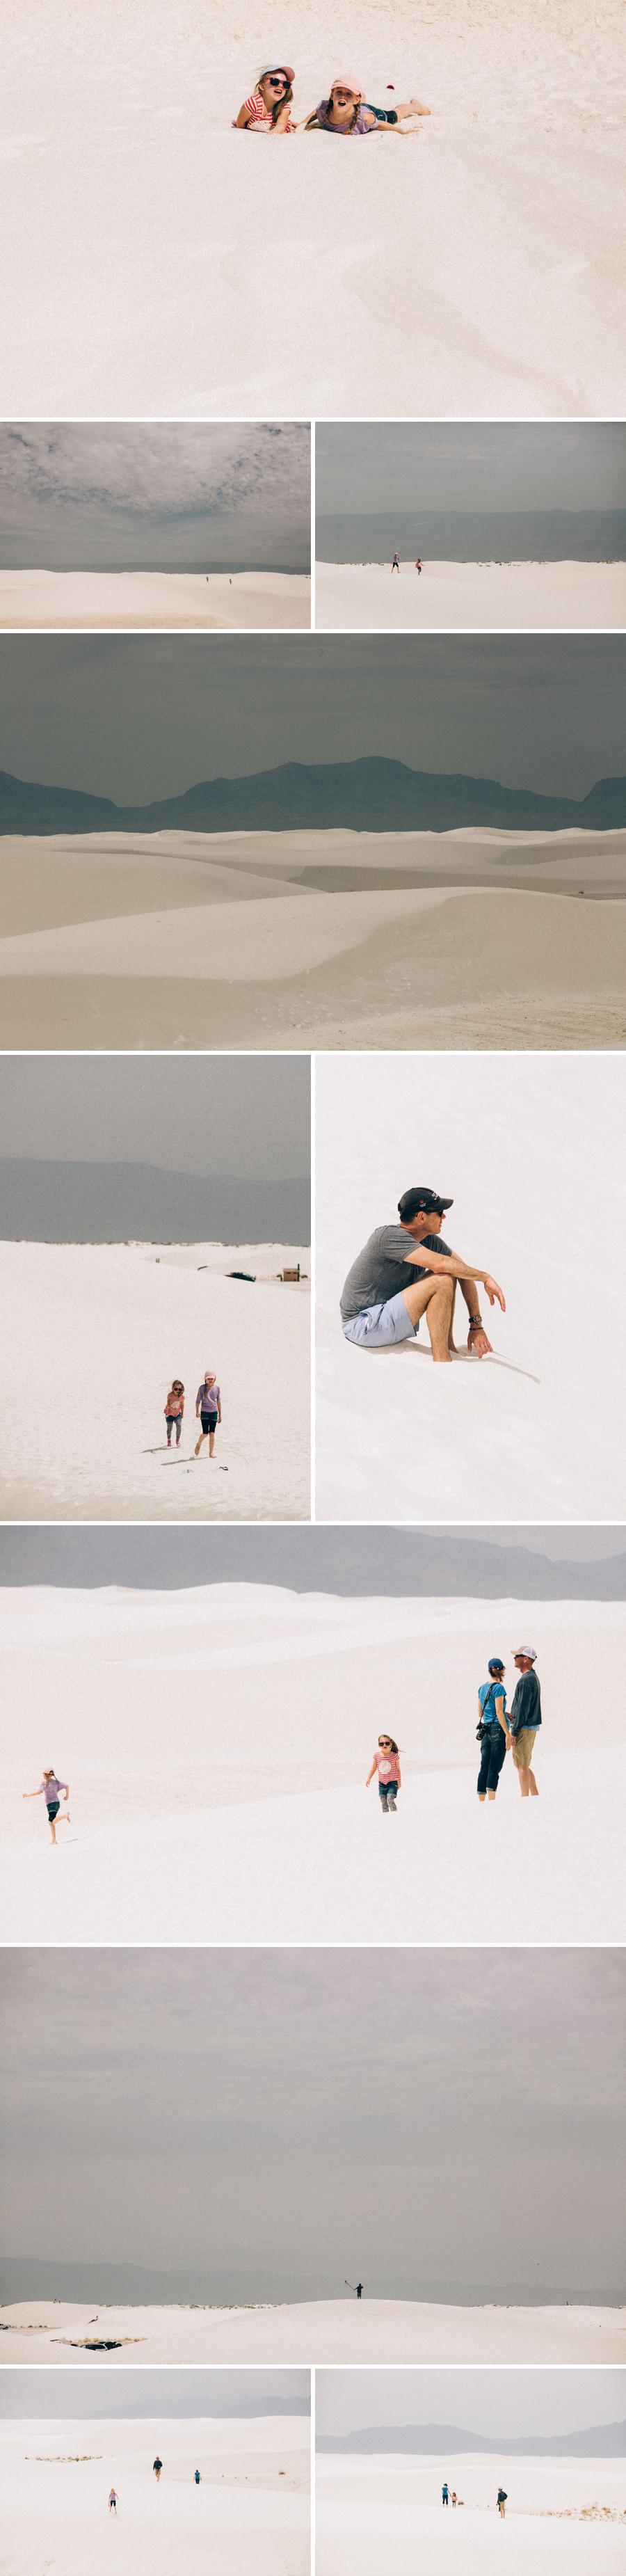 ElPaso-Family-Photographercomp004